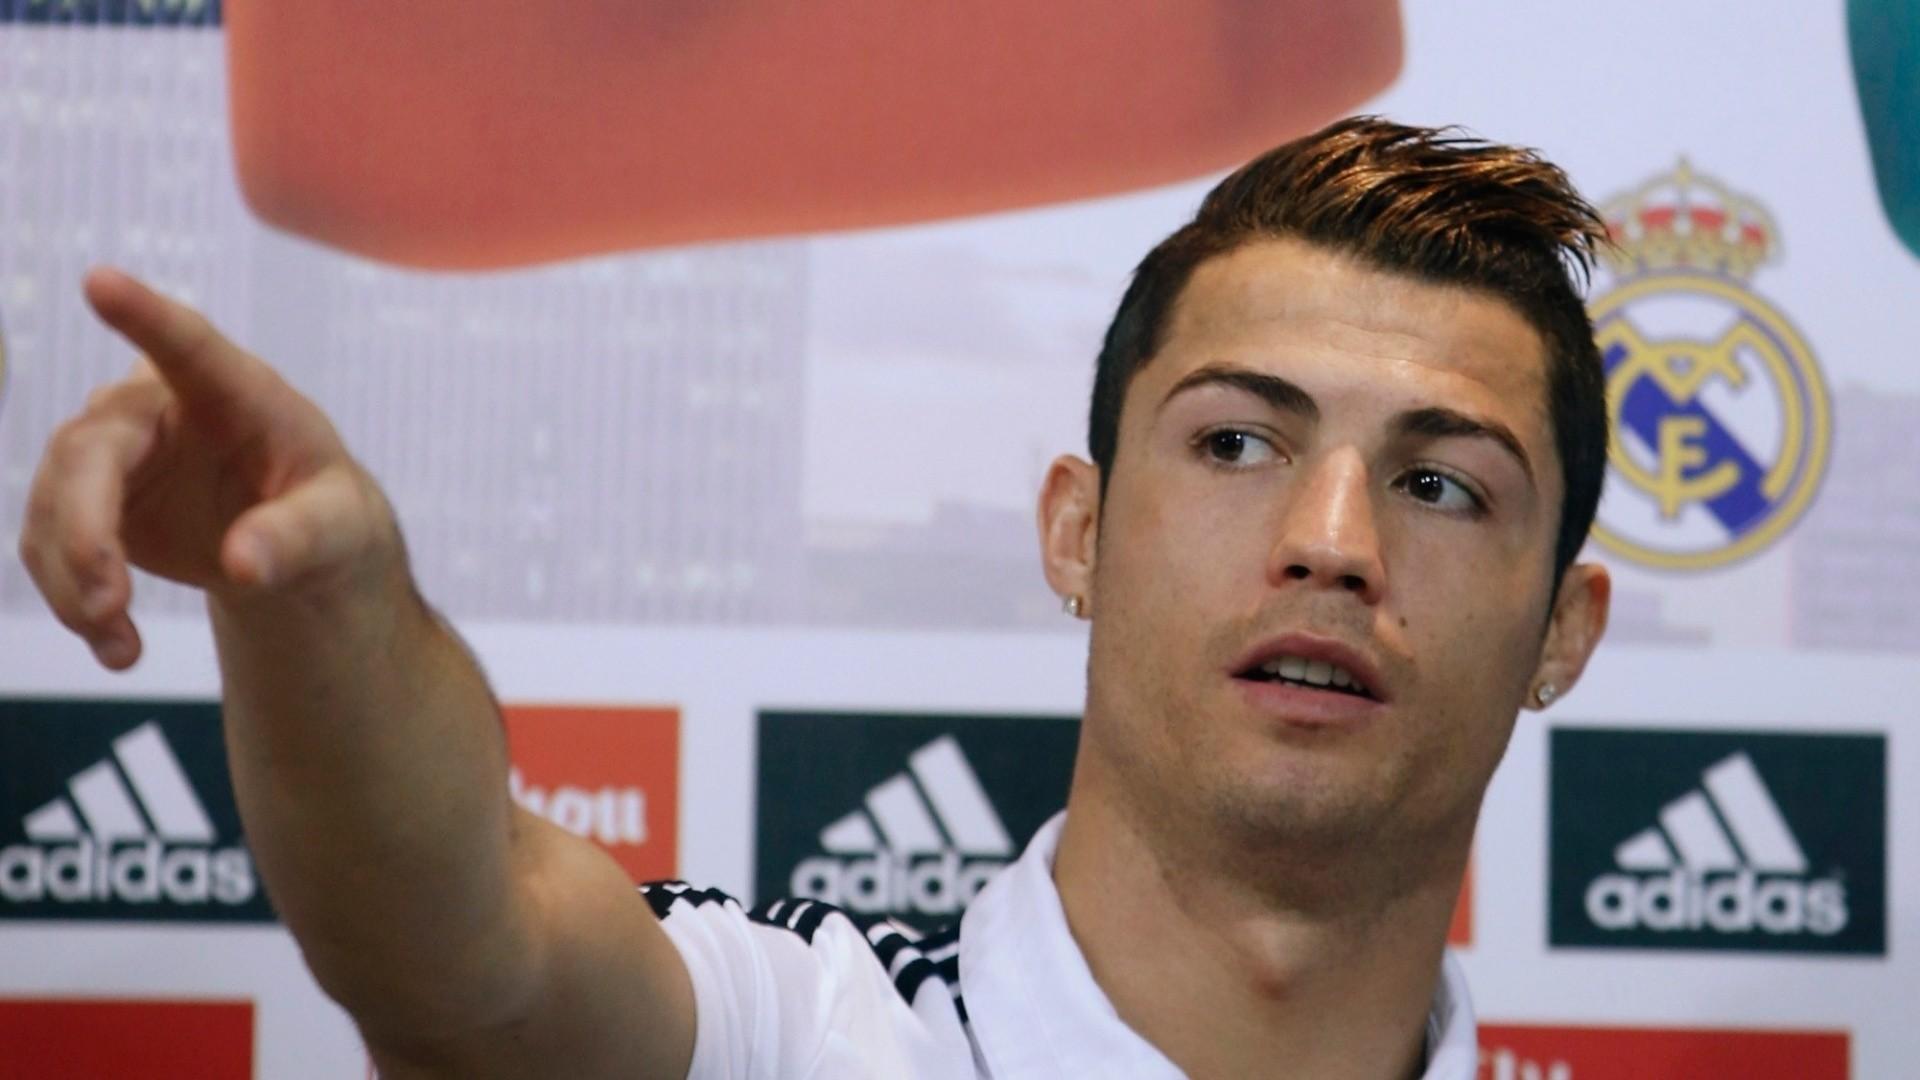 Cristiano Ronaldo 2018 Wallpaper 79 Images